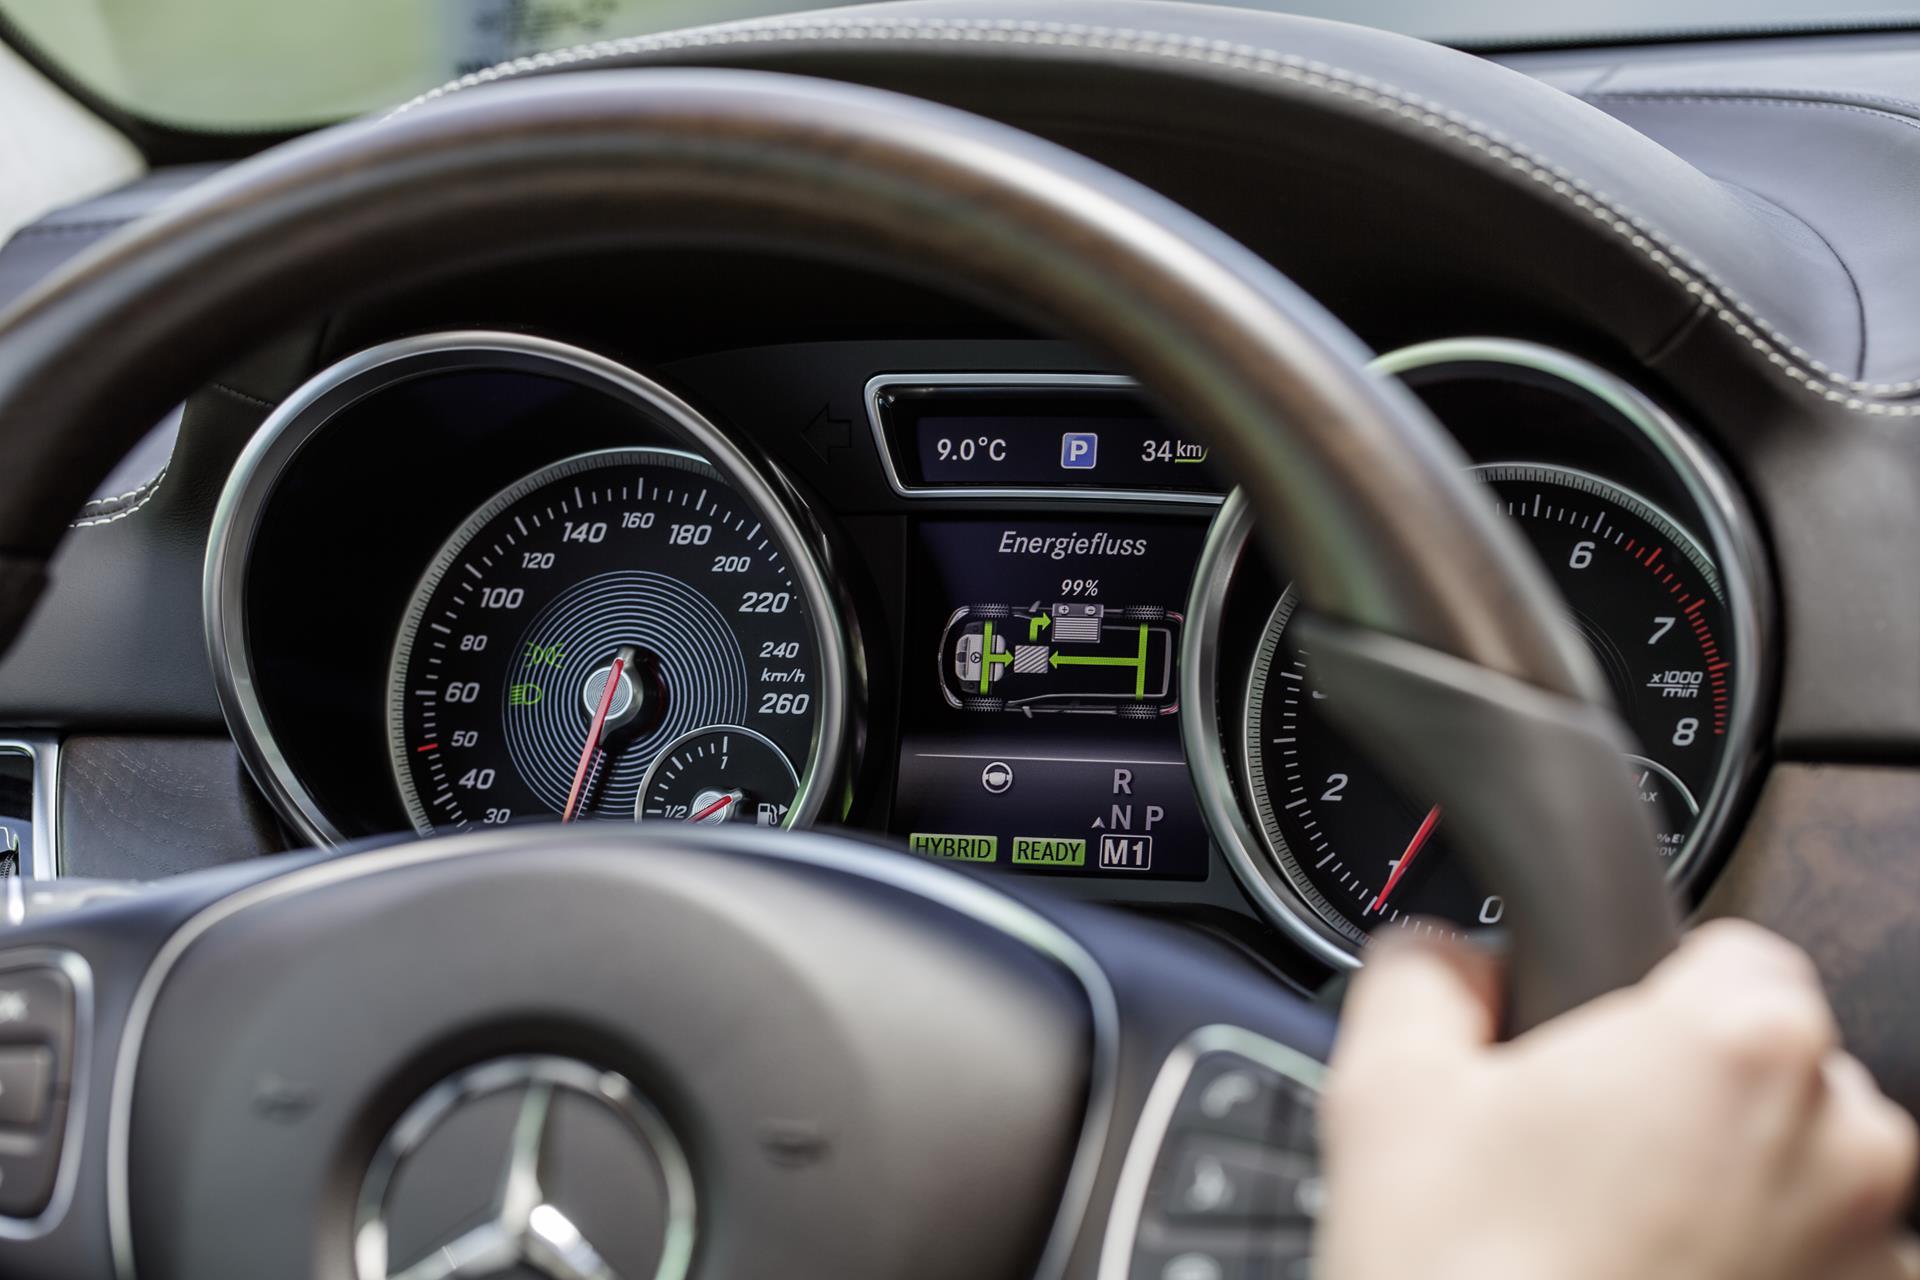 2016 Mercedes-Benz AMG GLE63